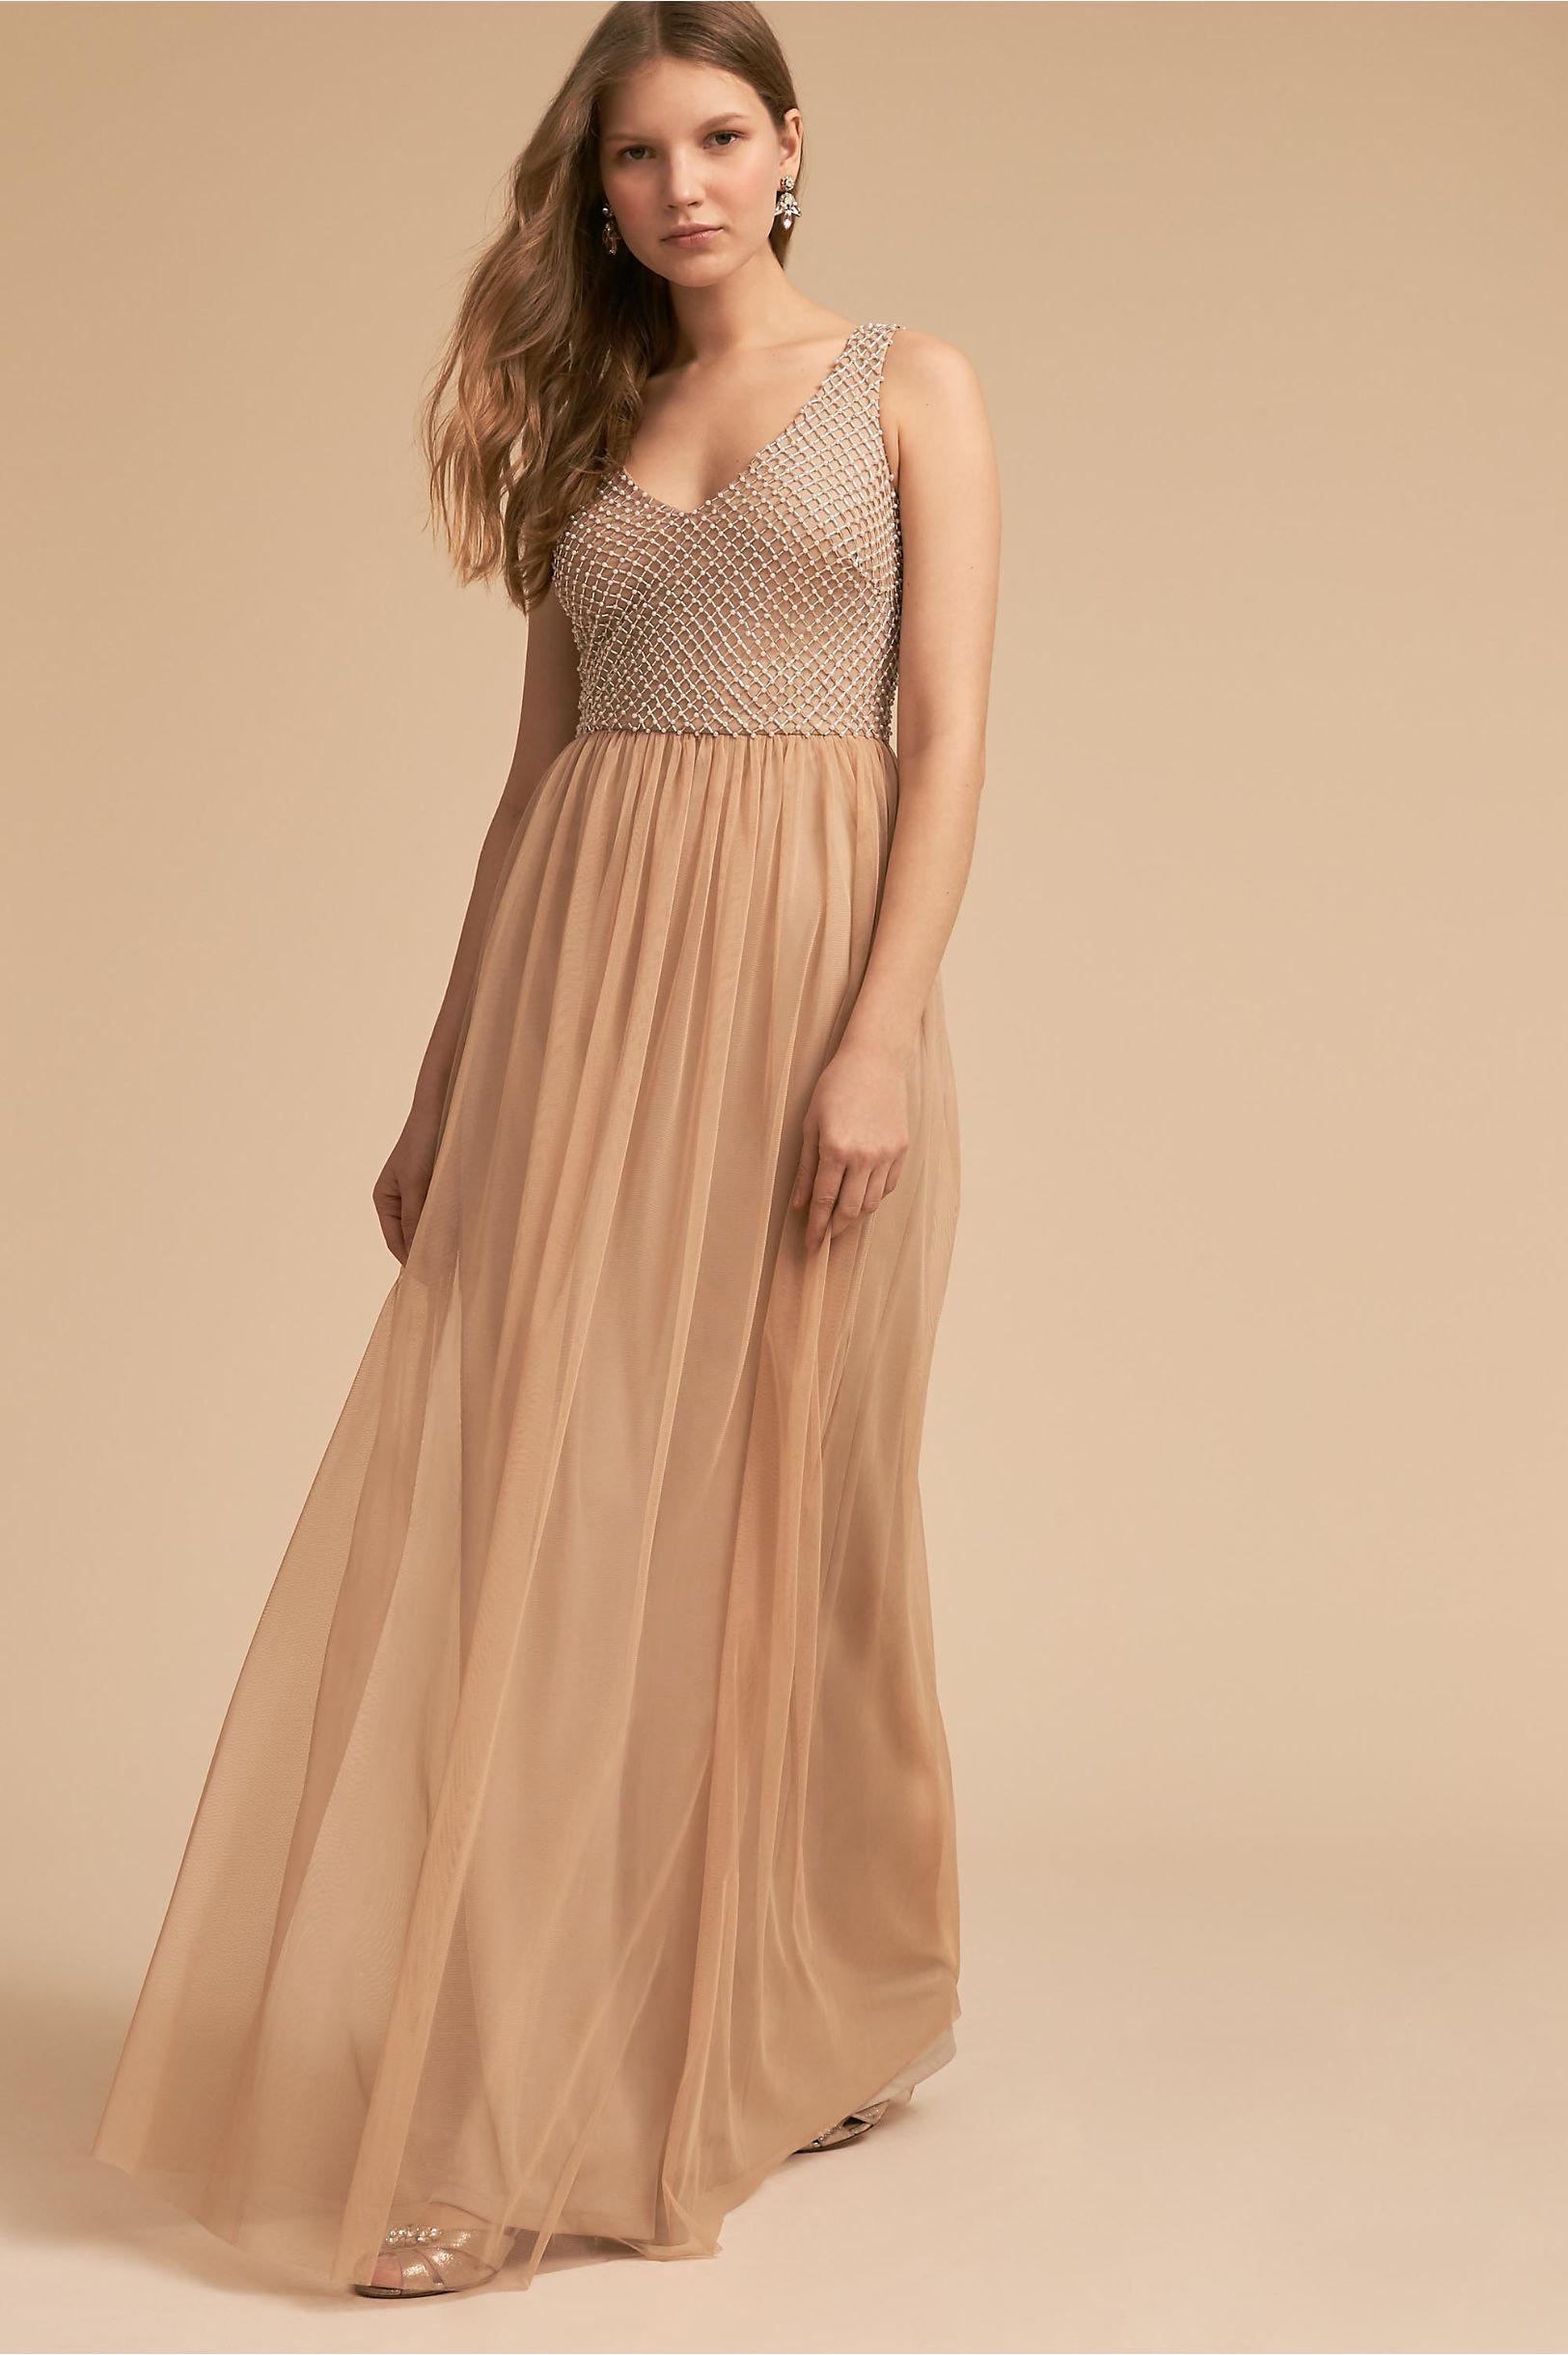 Bryce Dress in Sale | BHLDN